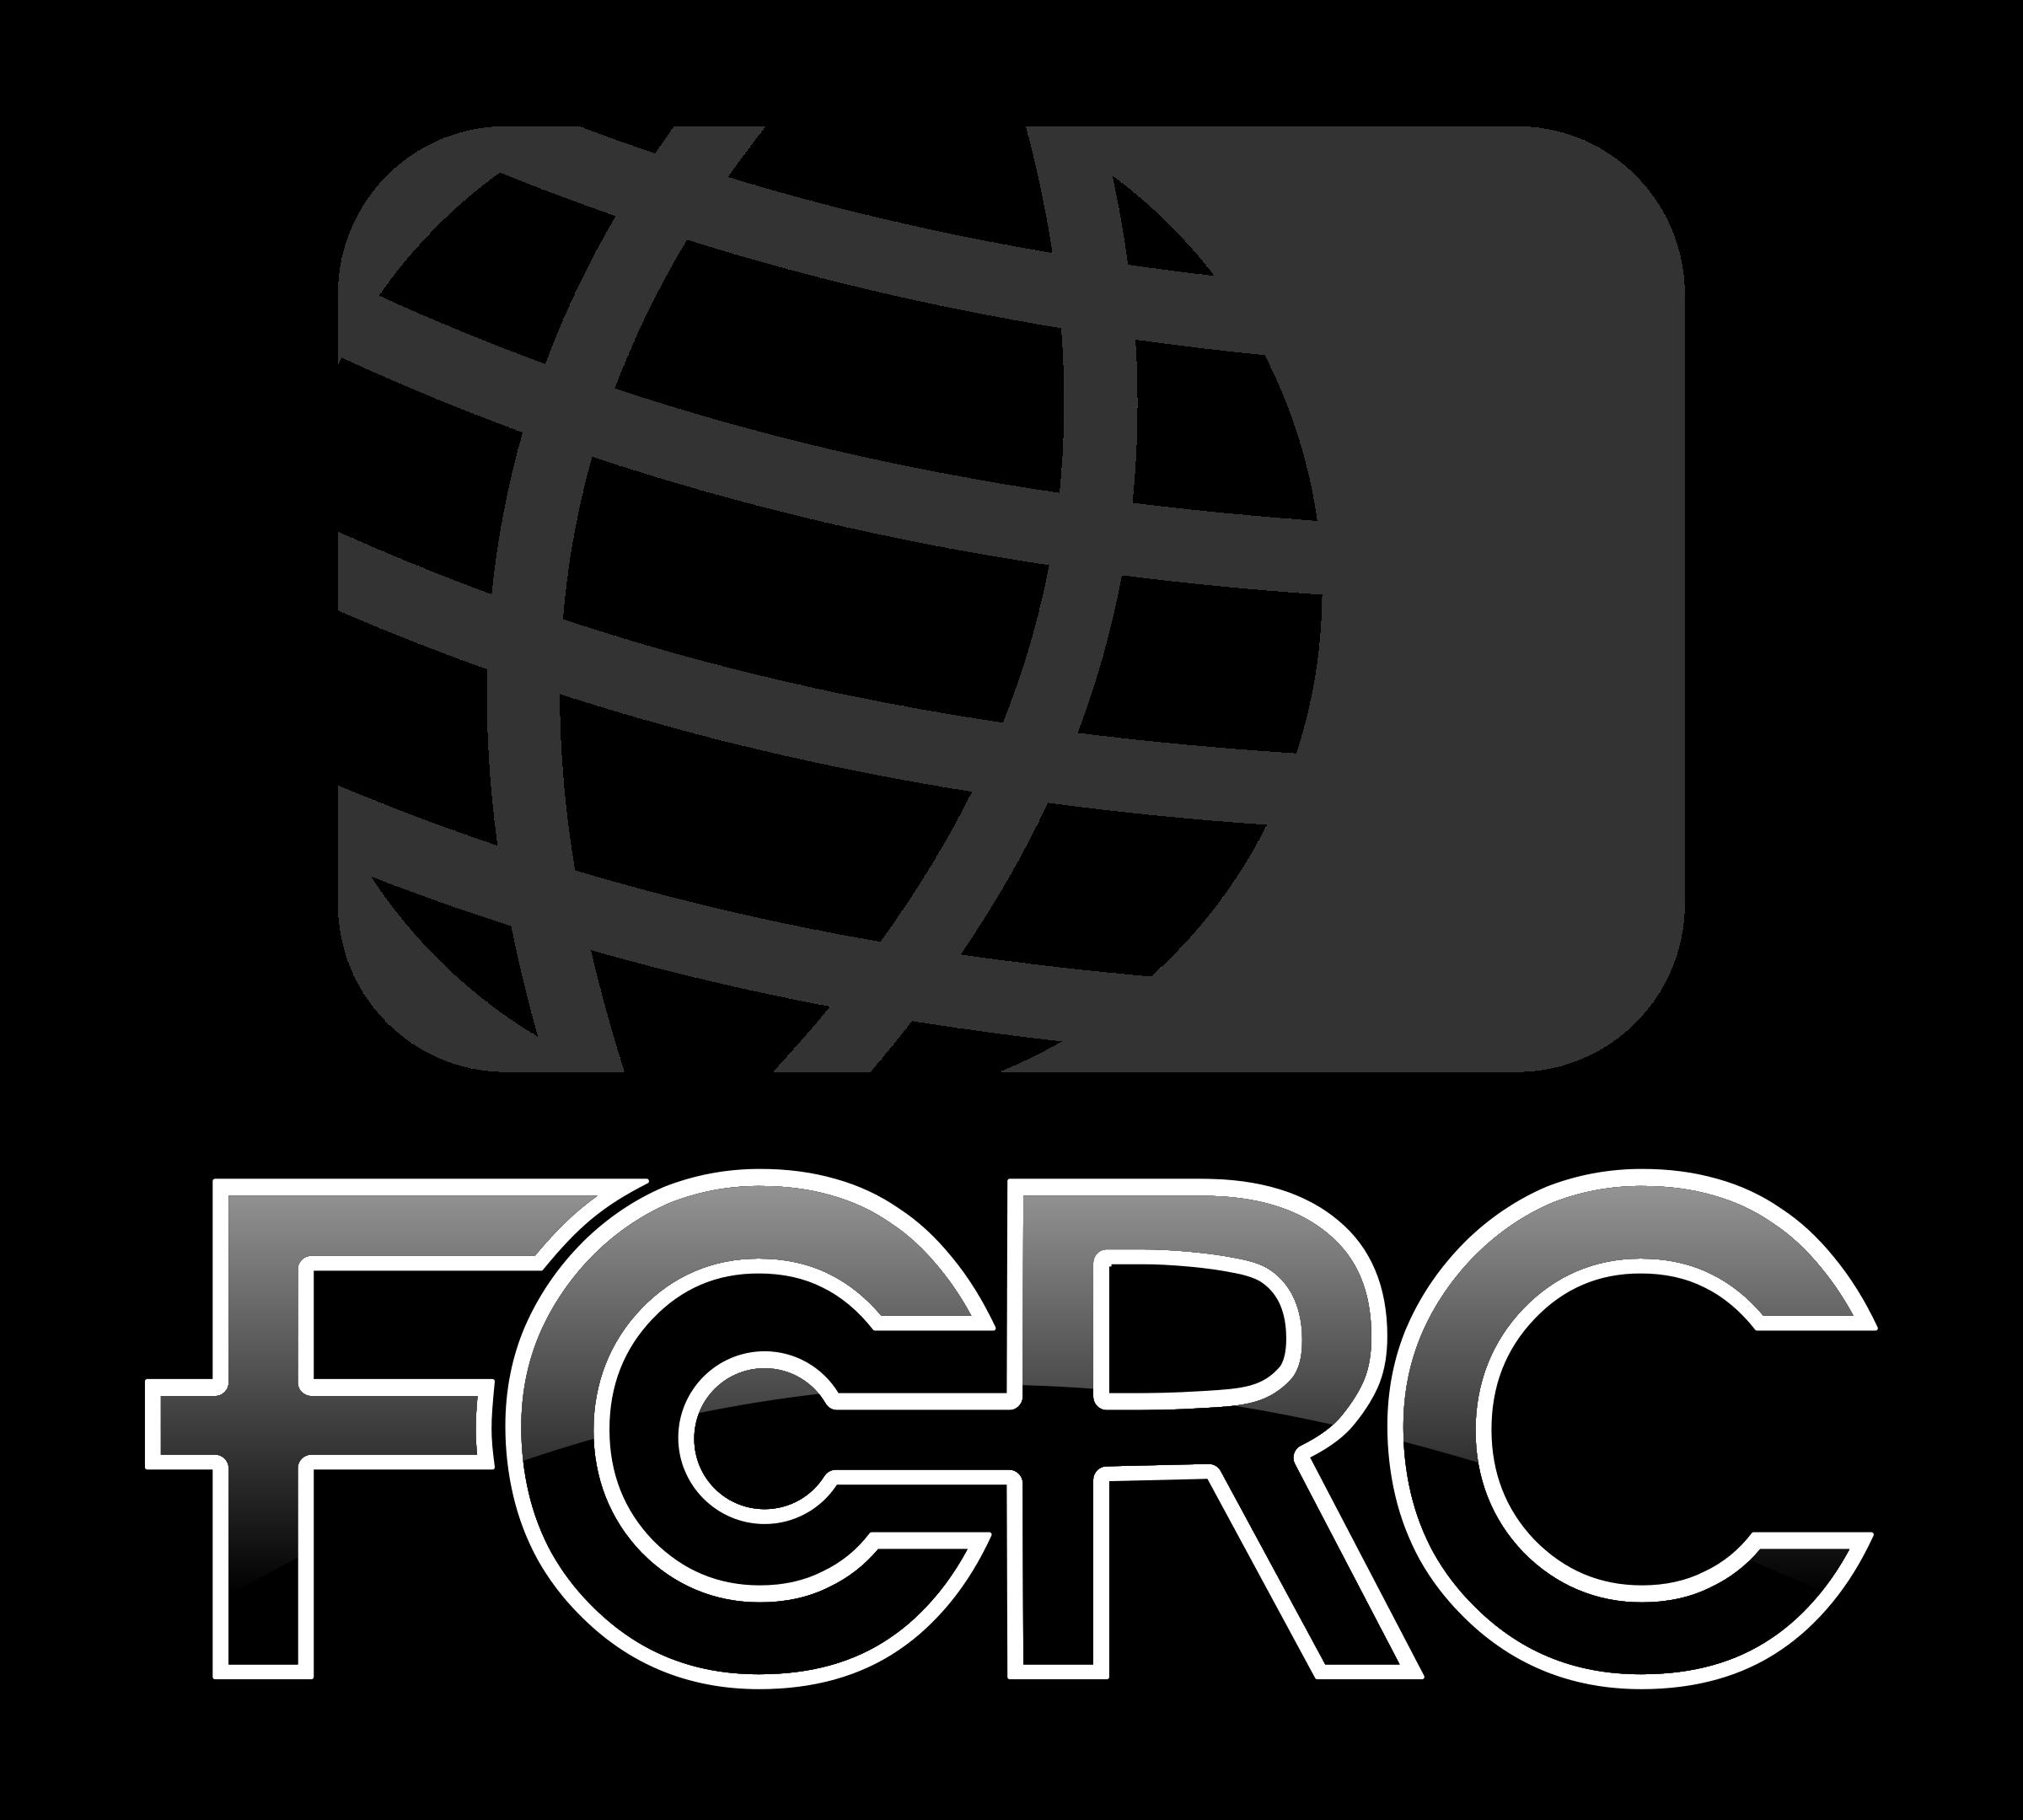 Clipart - FCRC globe logo 6 banner royalty free stock